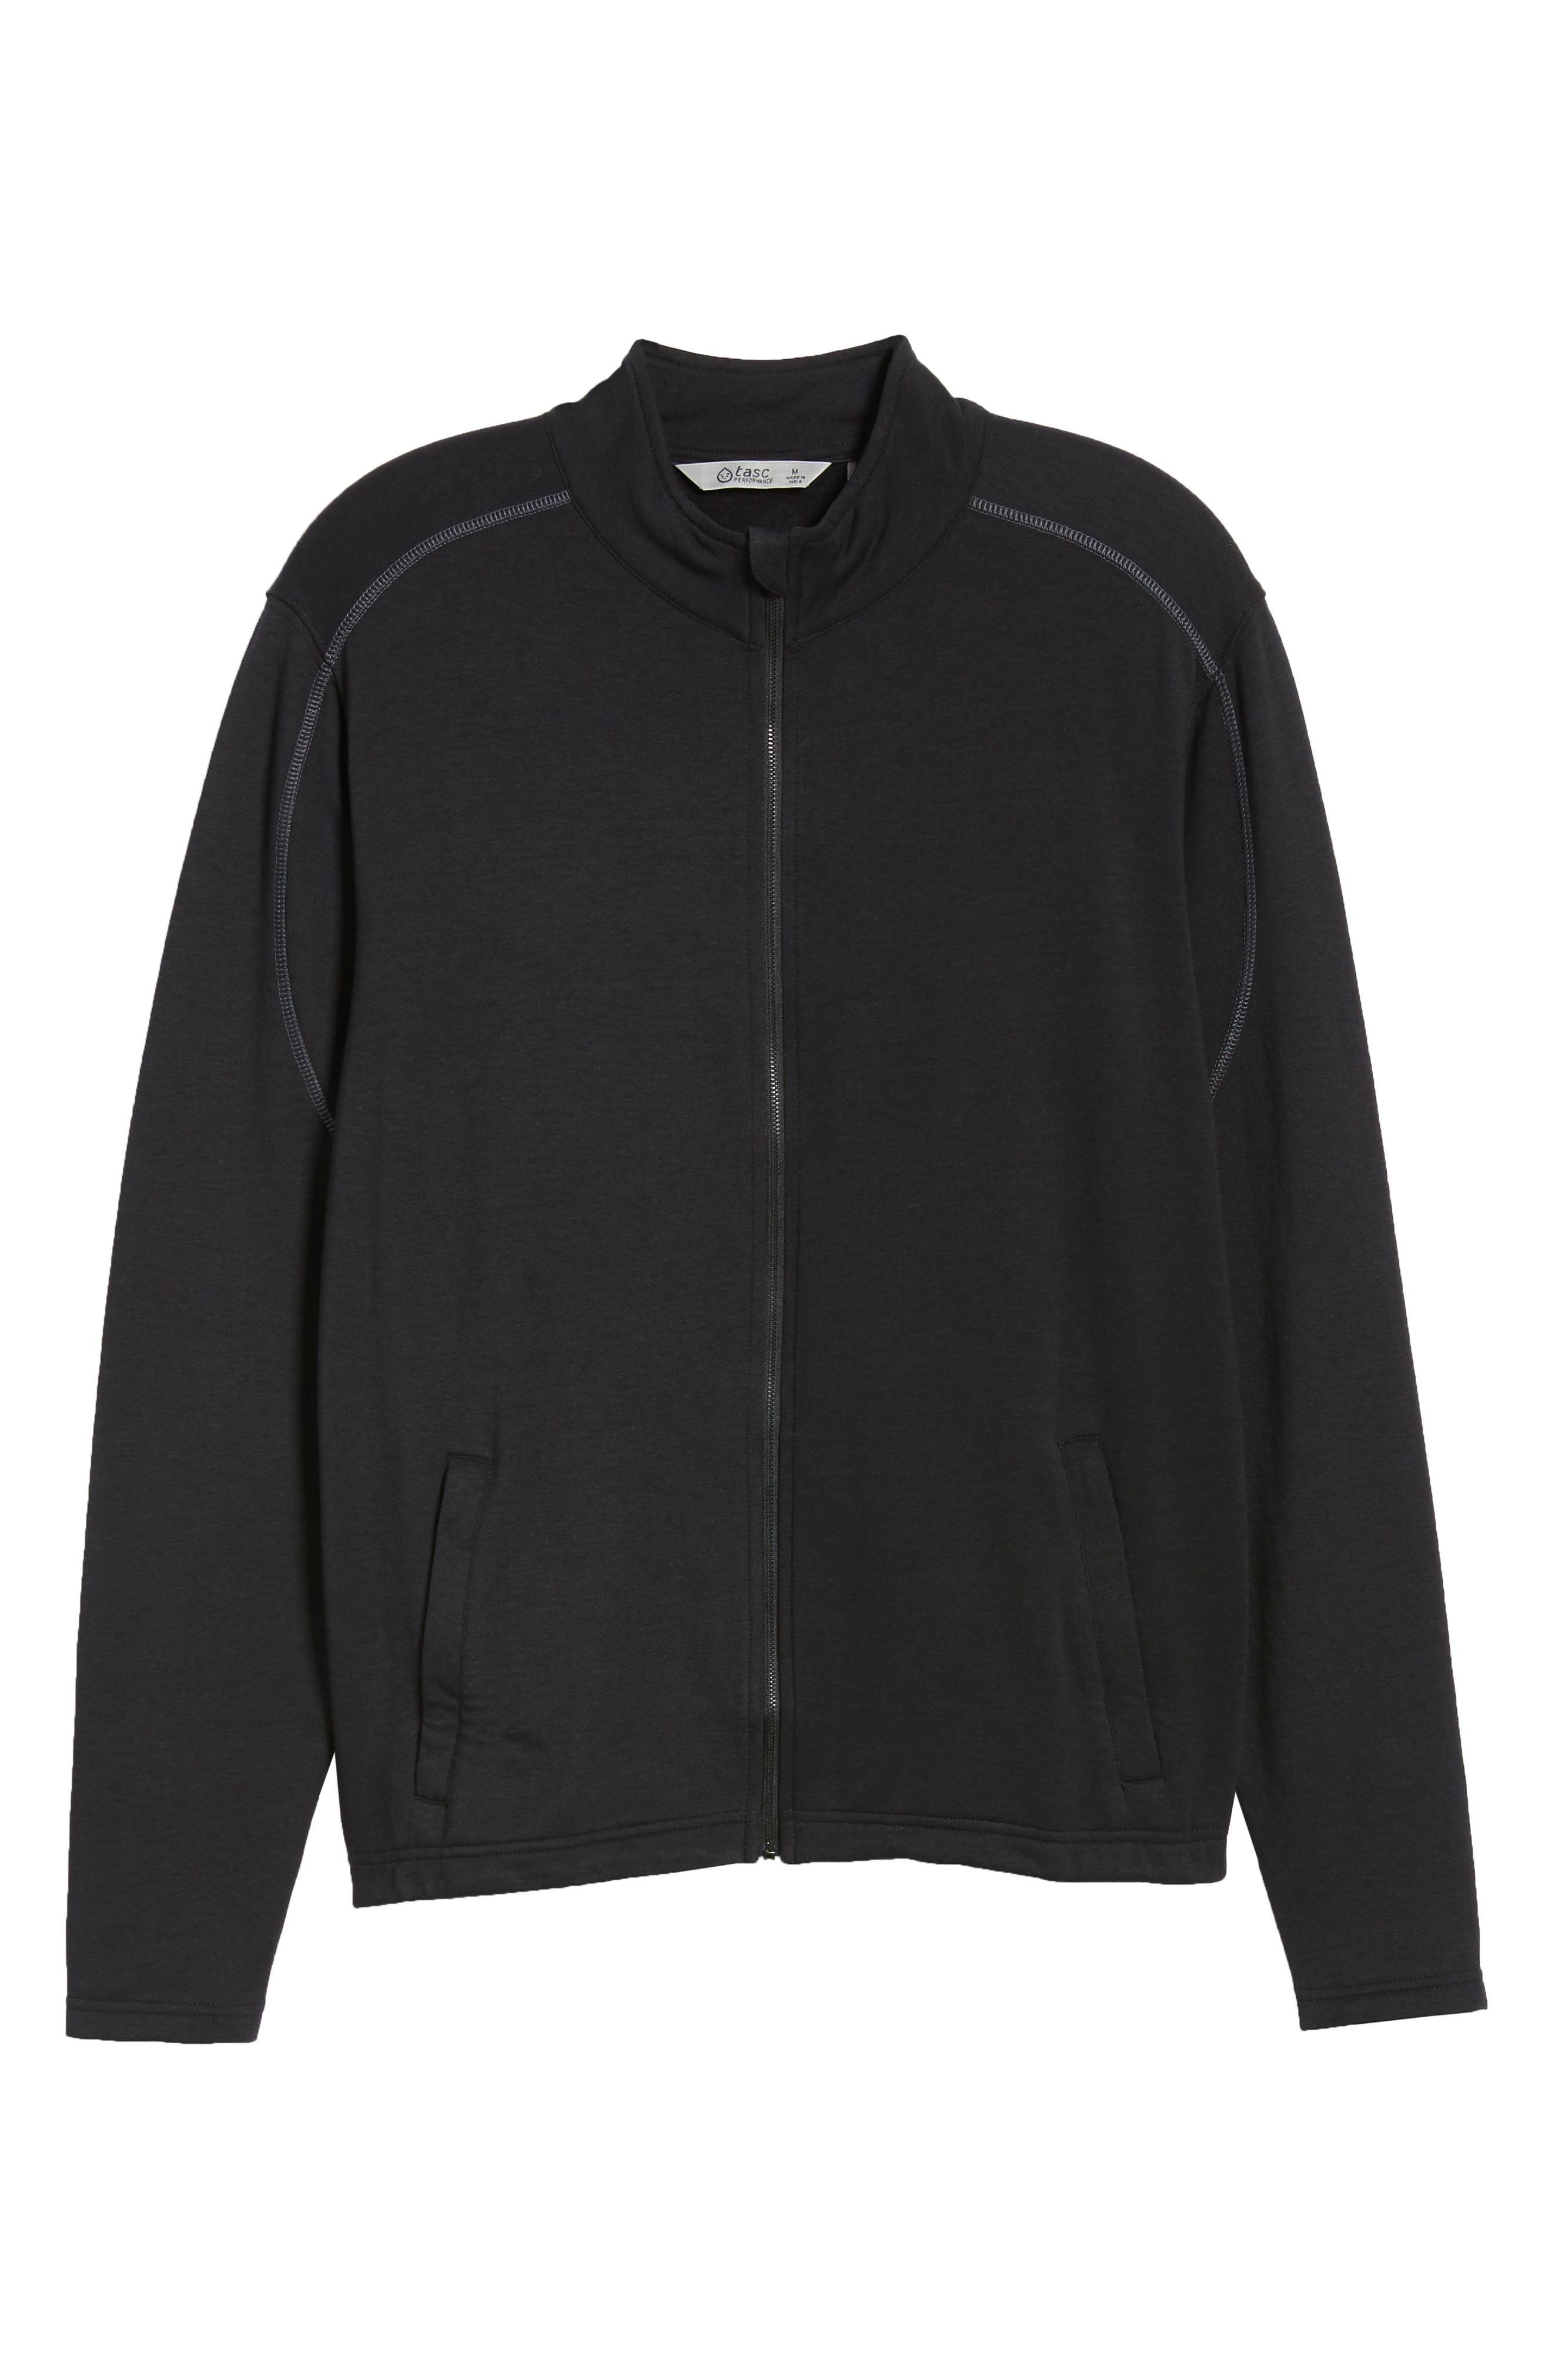 Tahoe II Fleece Jacket,                             Alternate thumbnail 5, color,                             BLACK